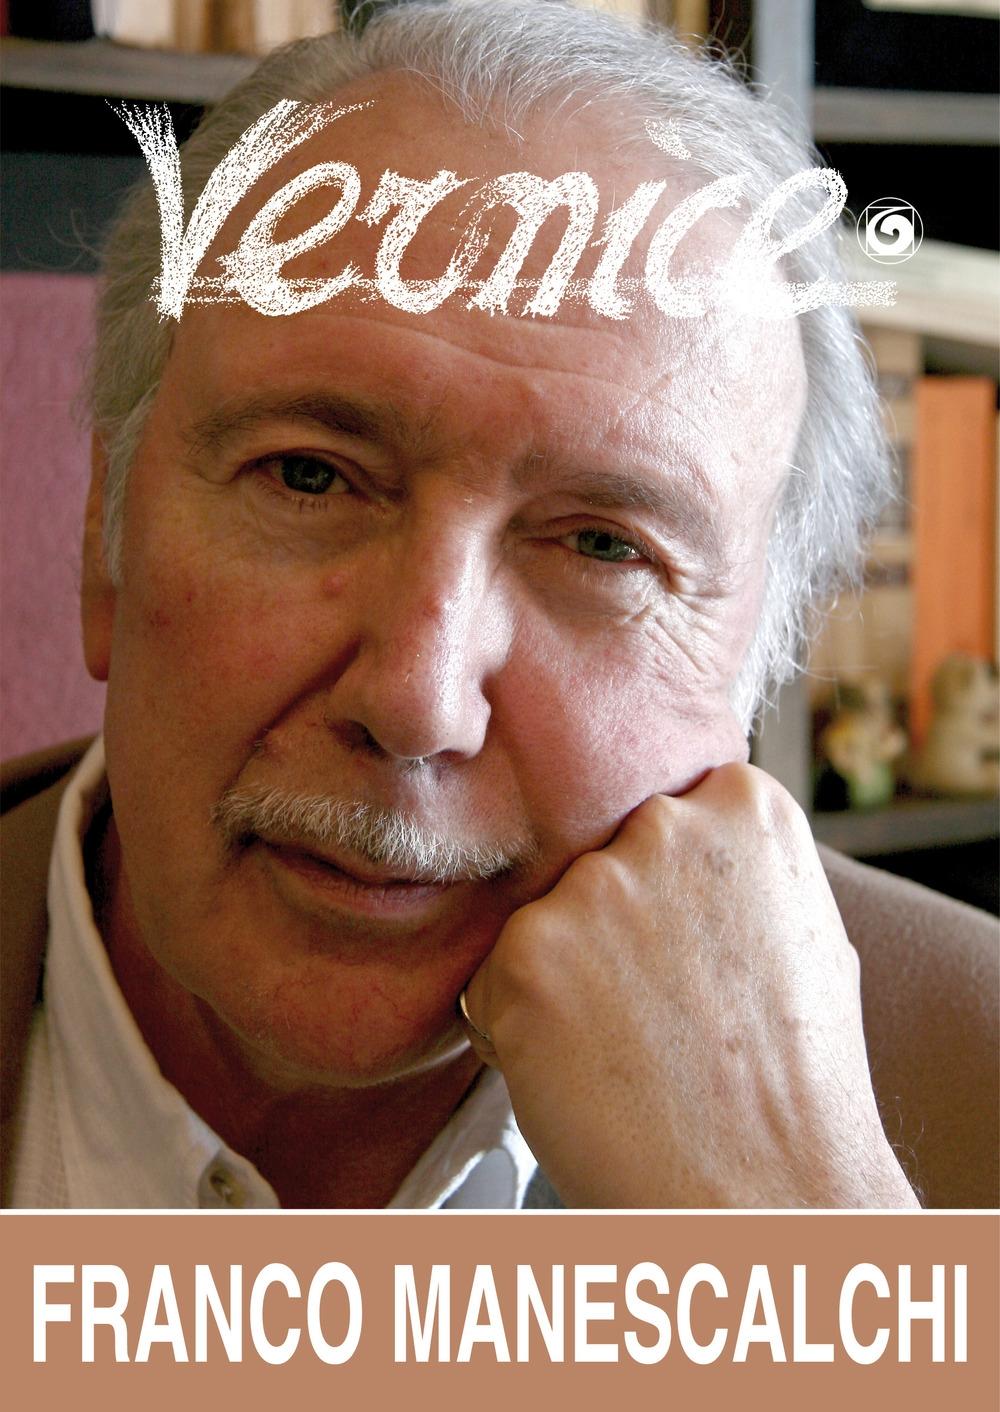 Vernice n. 55. Intervista a Franco Manescalchi